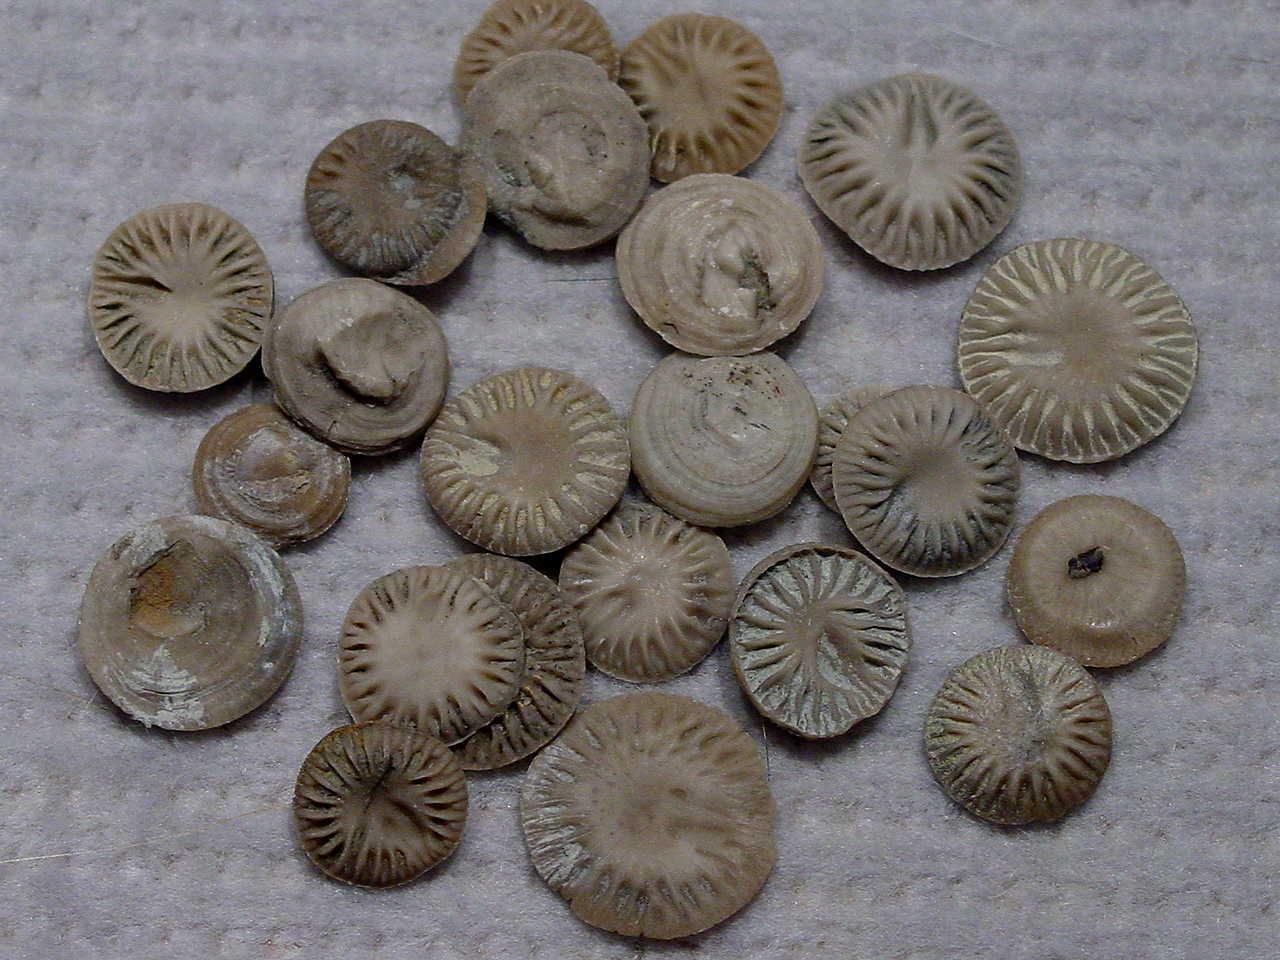 Microcyclus